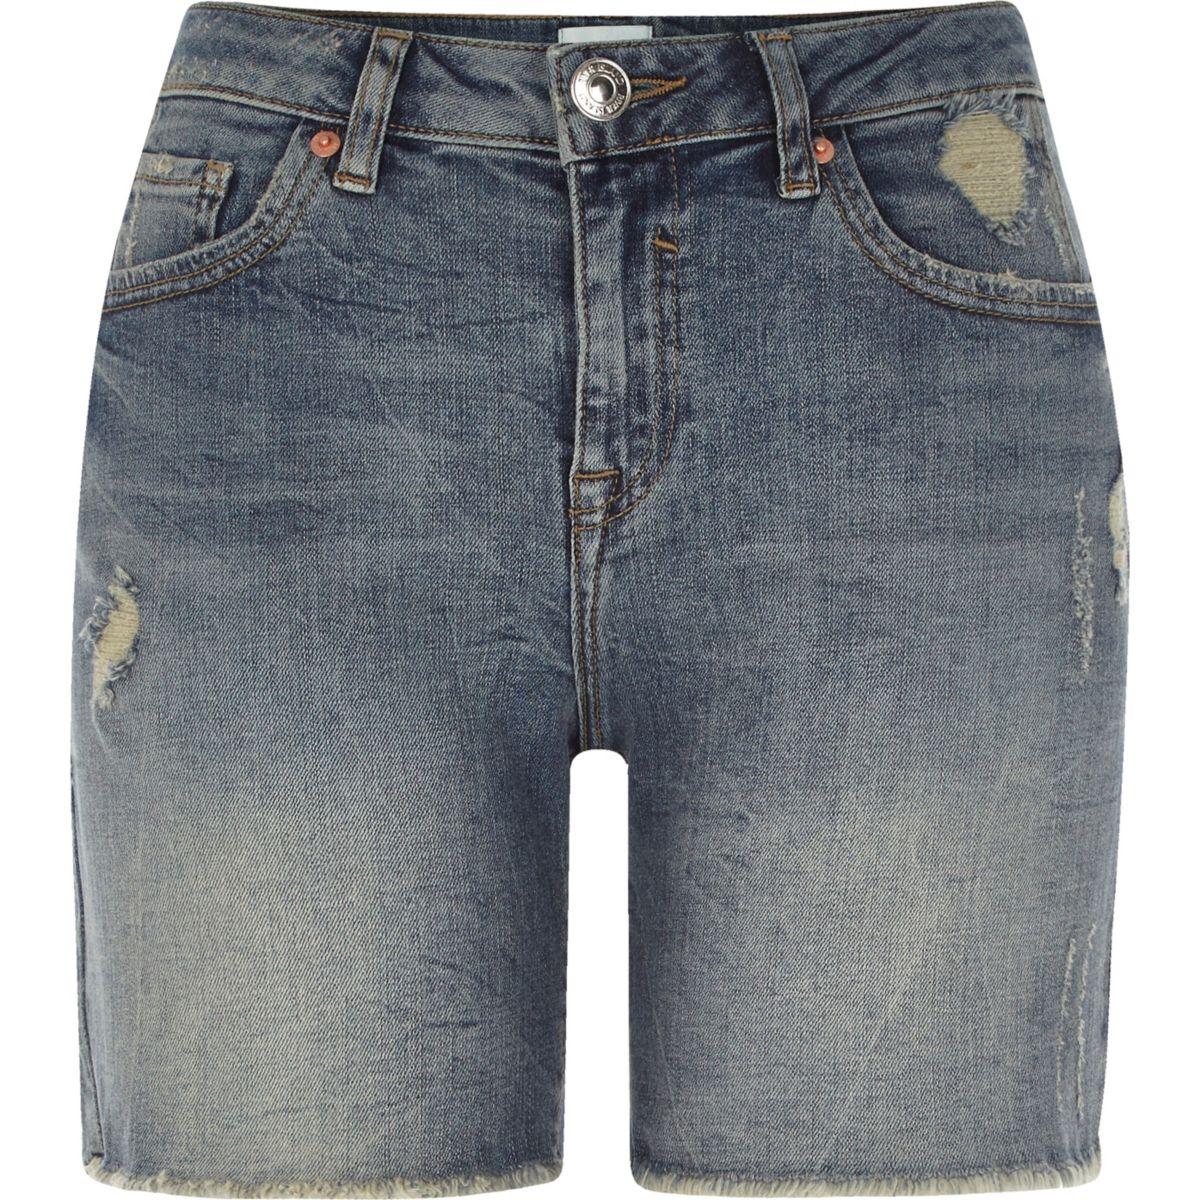 Mid blue distressed denim boyfriend shorts